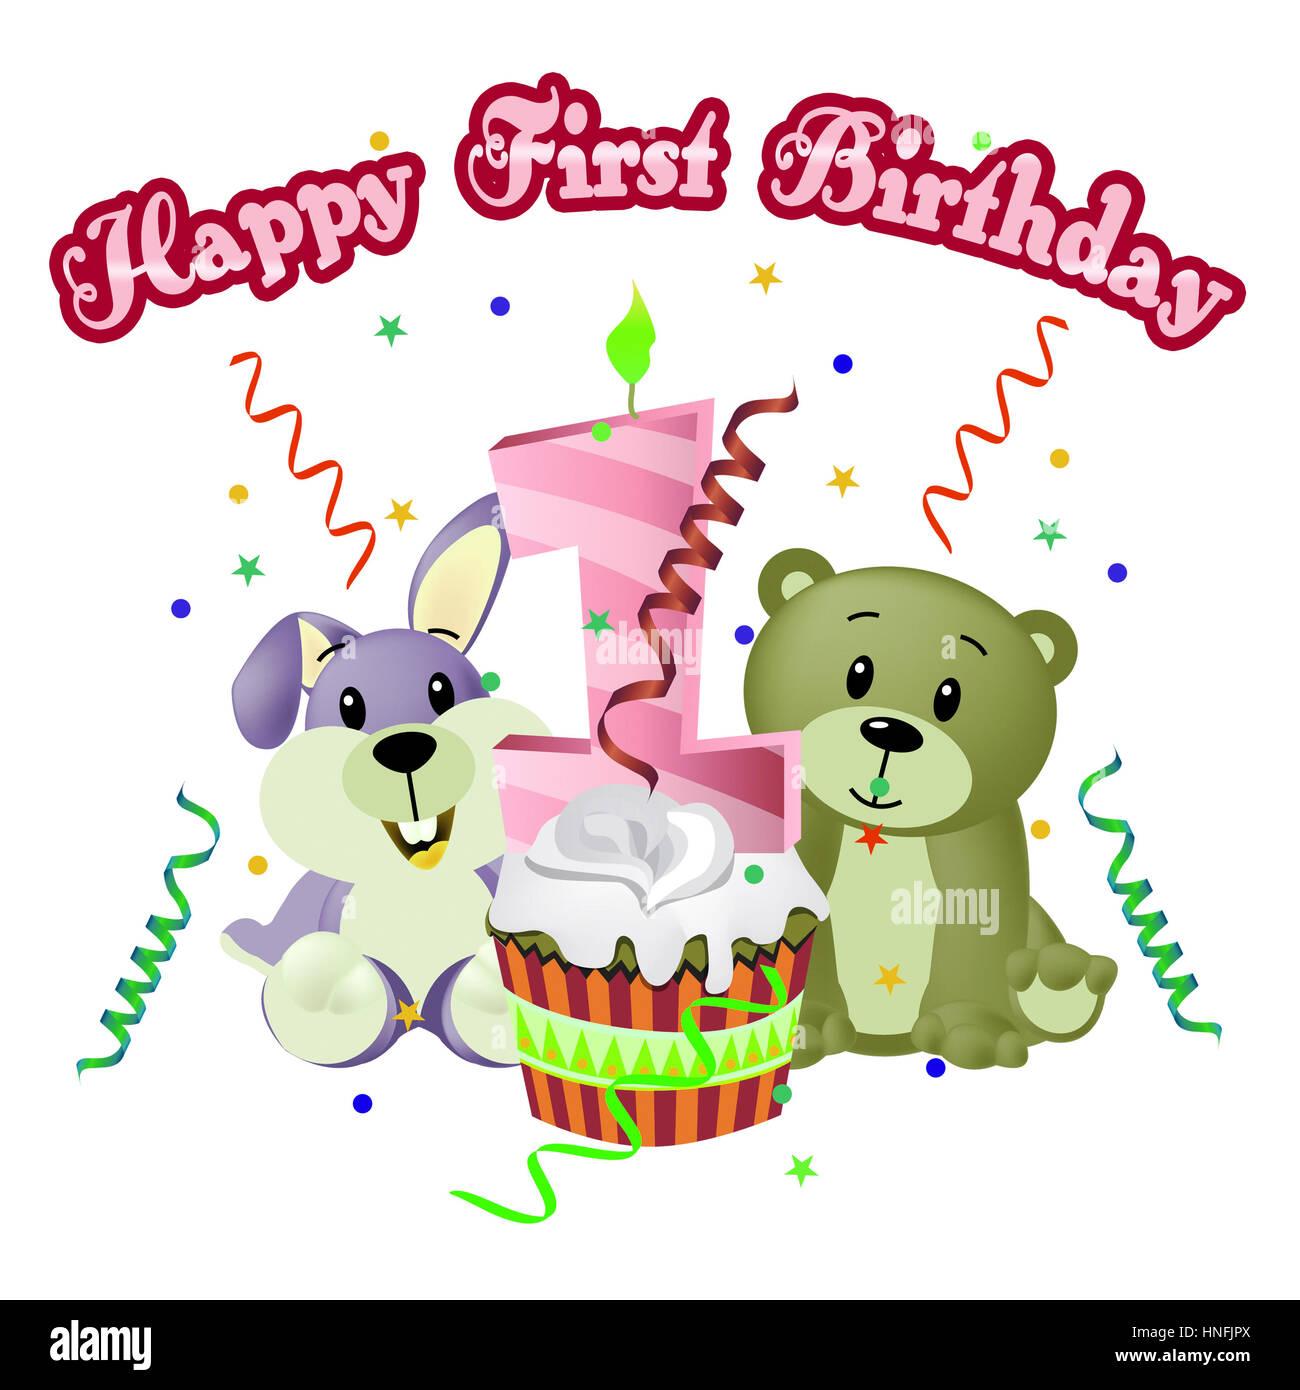 How to originally congratulate happy birthday in prose 9